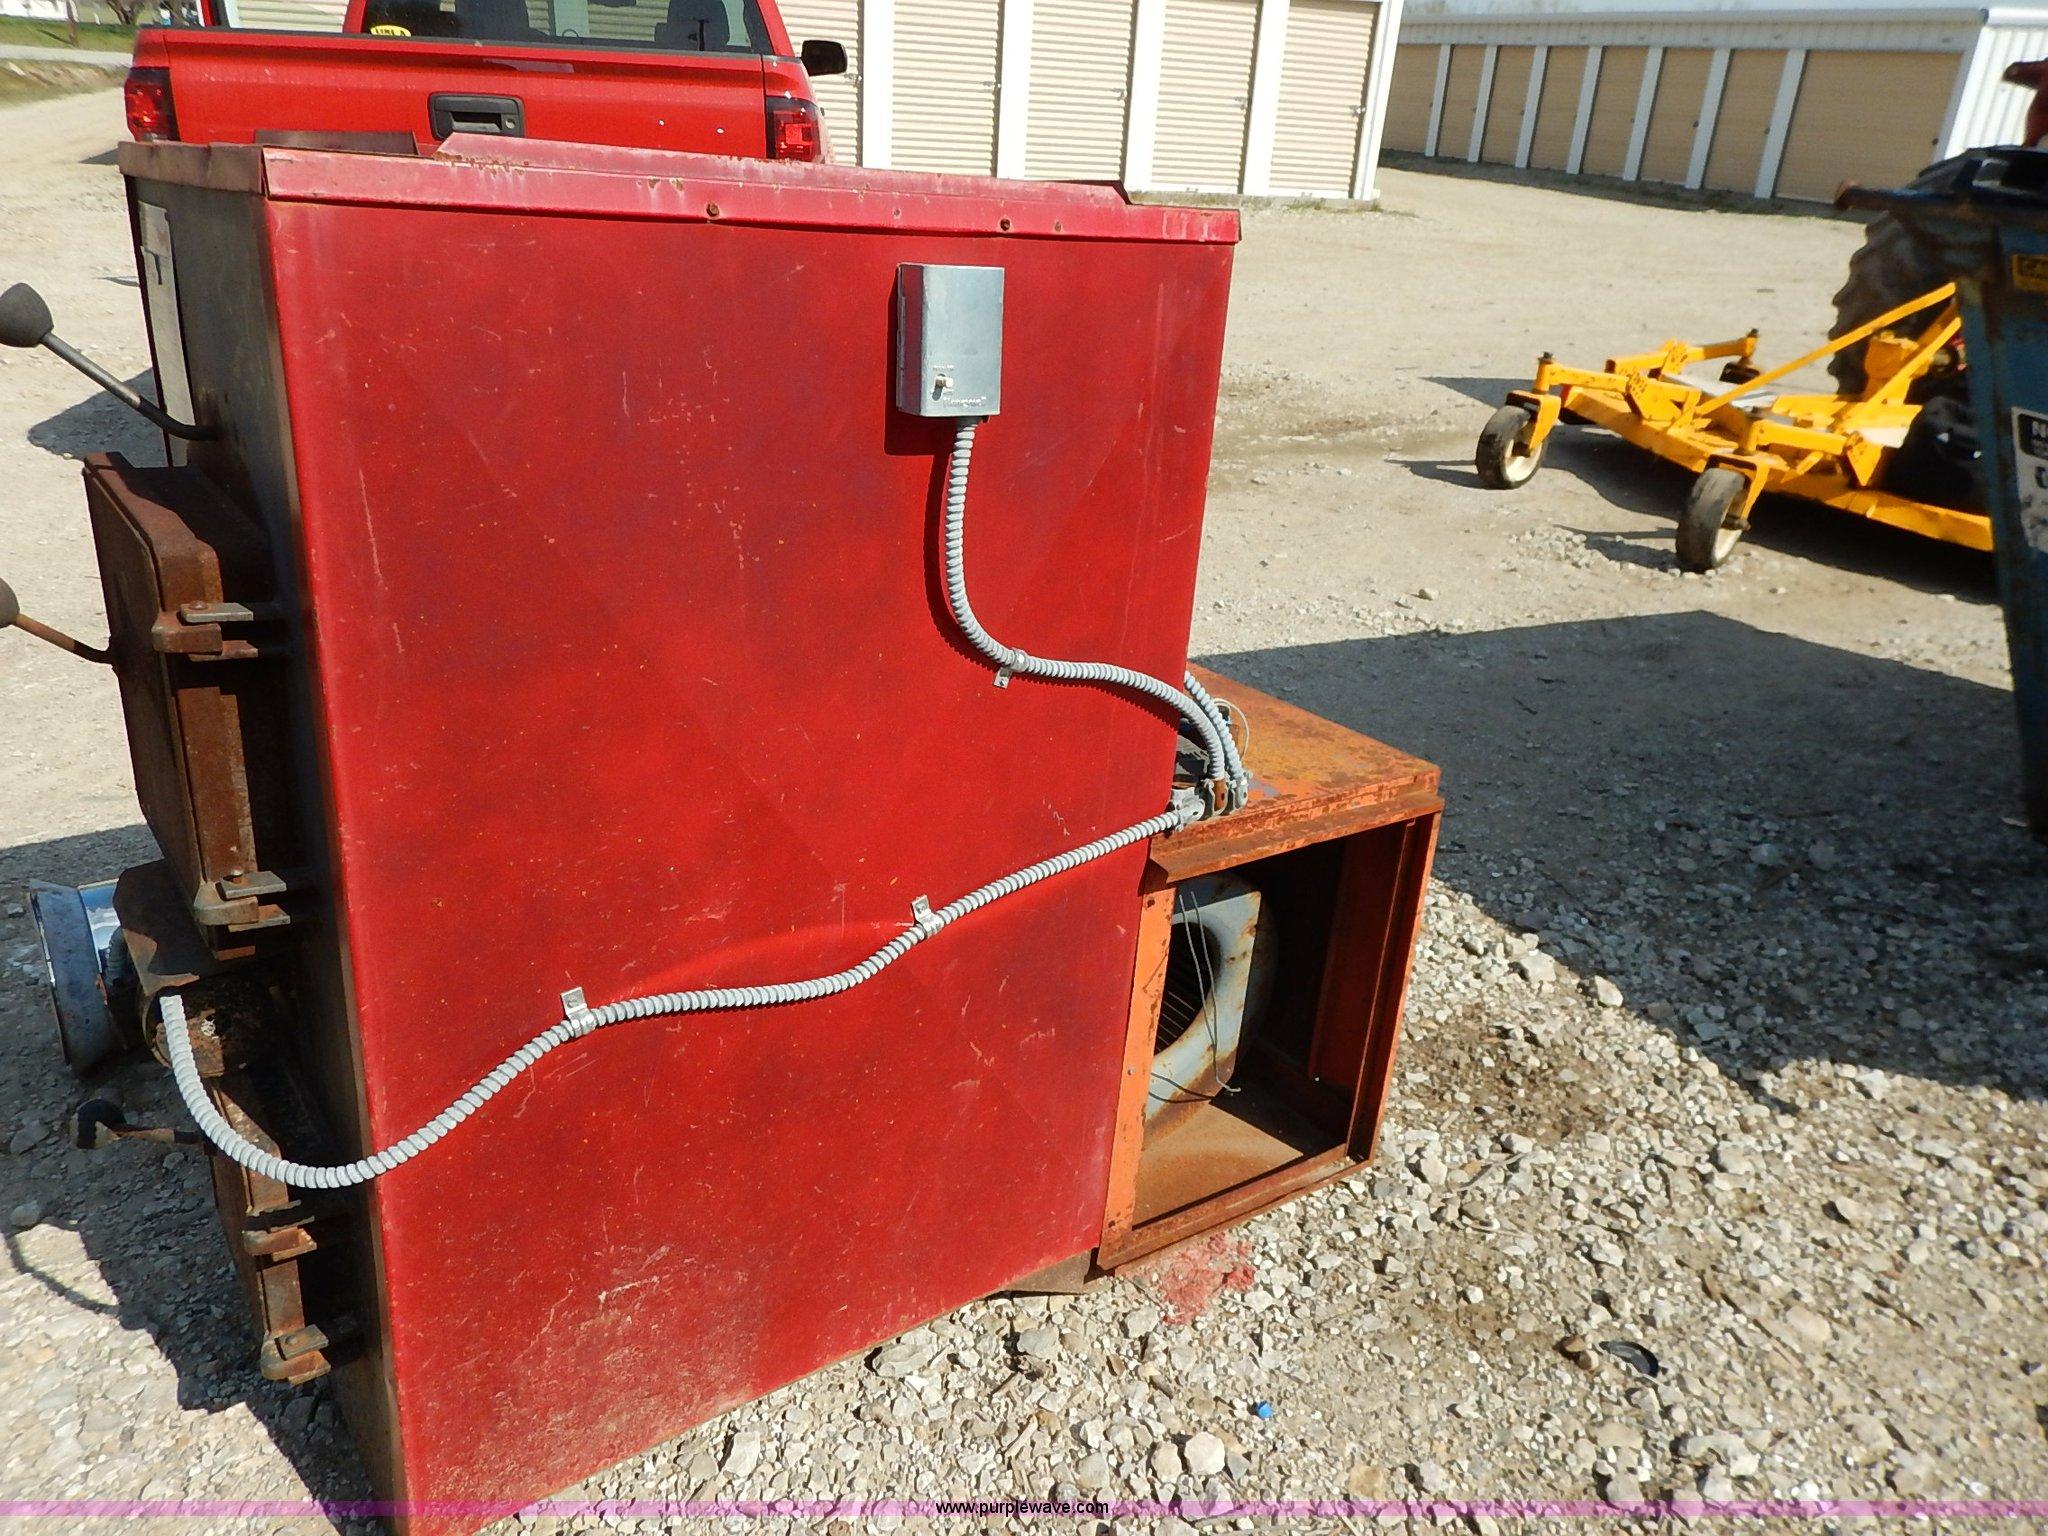 BJ9676B fire chief wood furnace wiring diagram nemetas aufgegabelt info